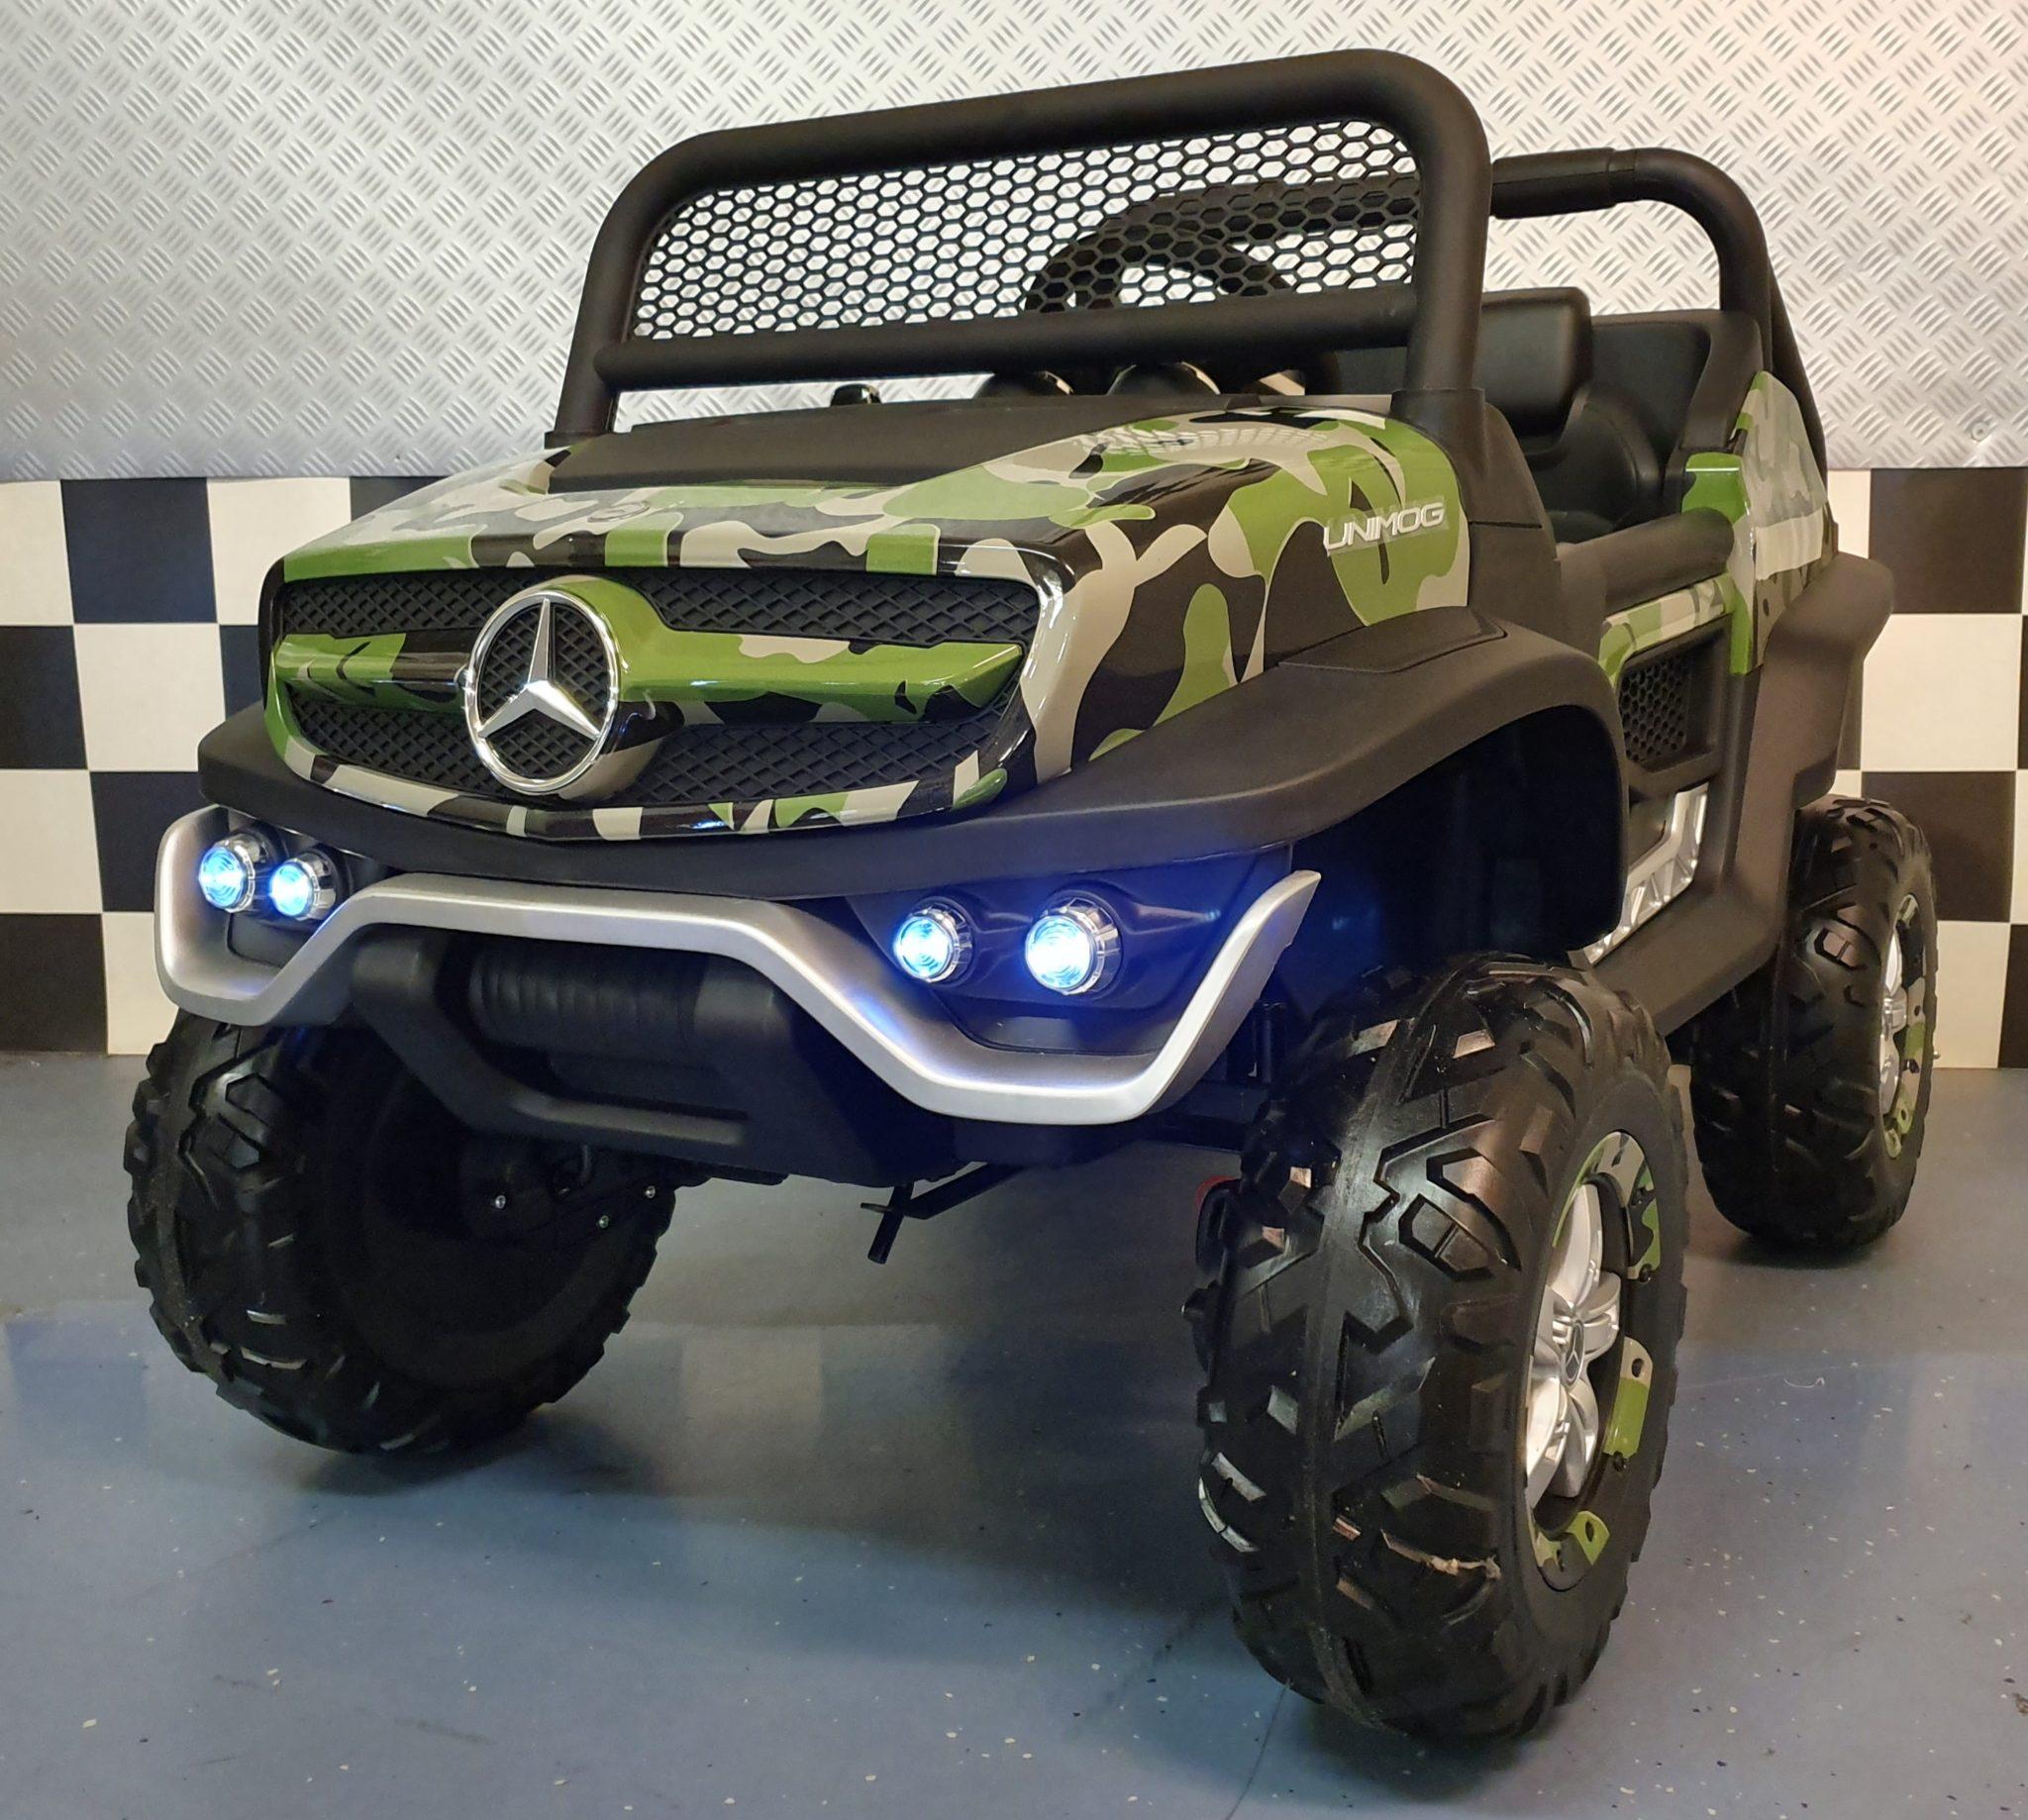 Elektrische kinder auto Mercedes Unimog camouflage 4×4 2 persoons